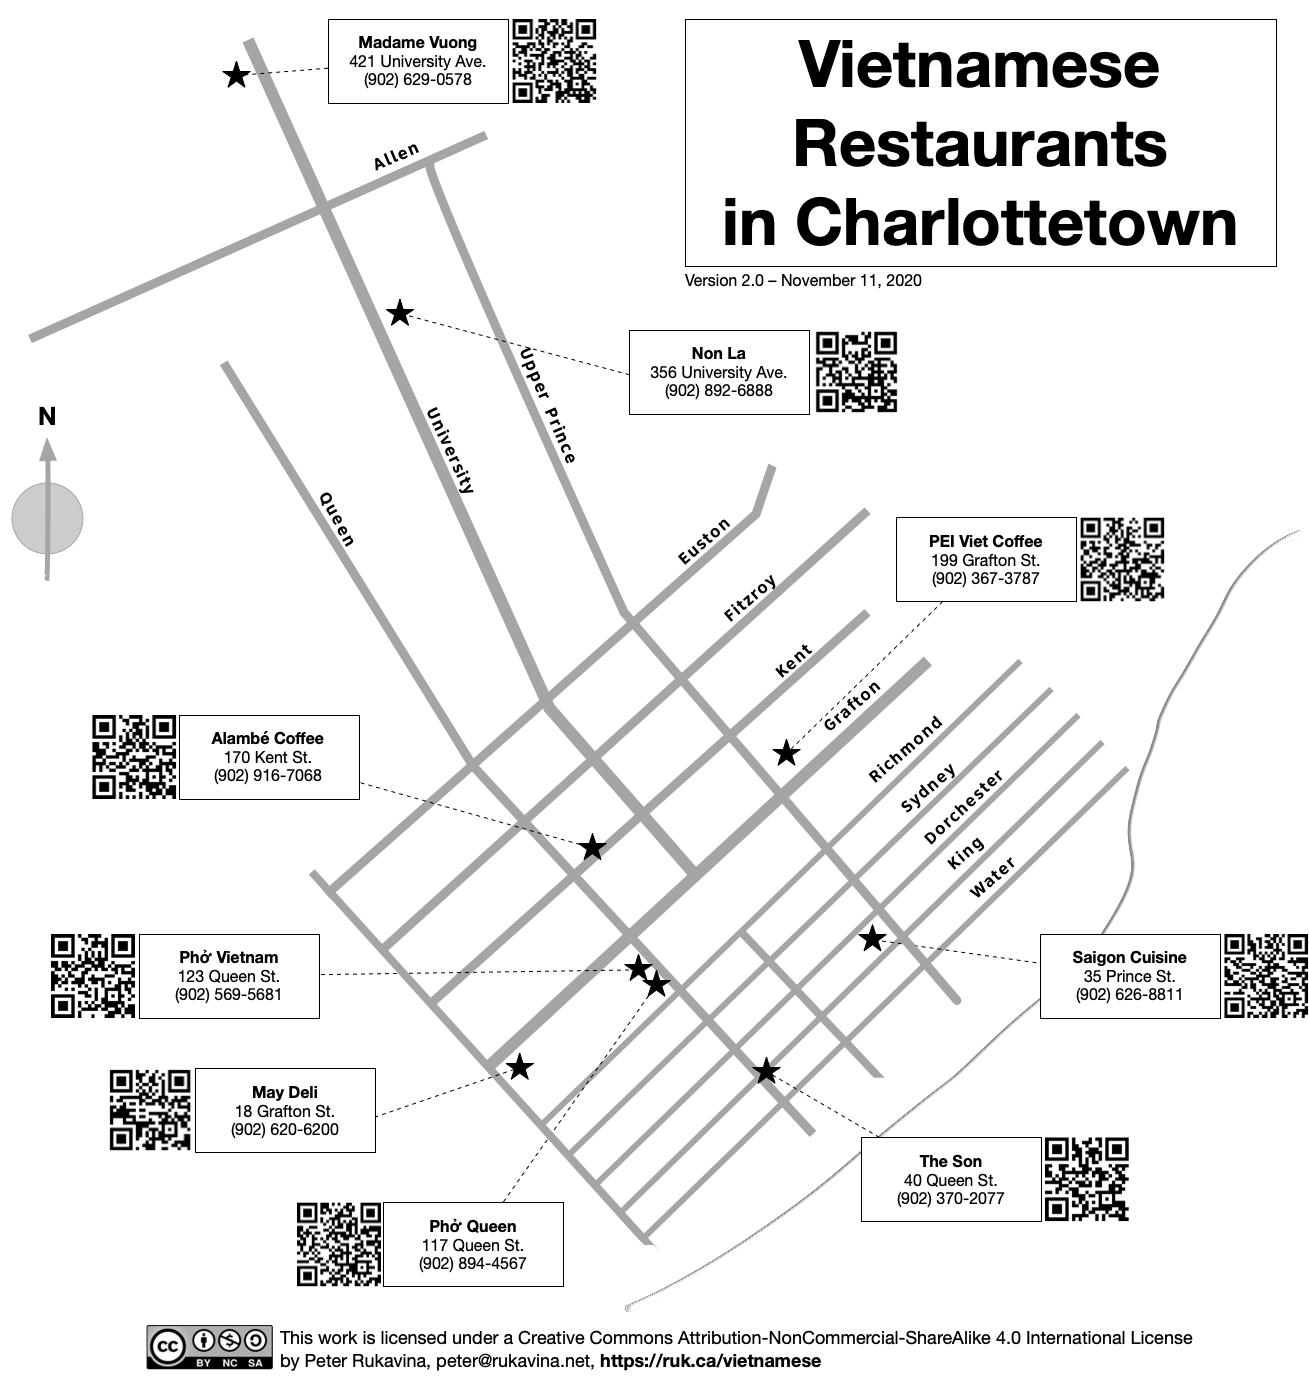 Map of Vietnamese Restaurants in Charlottetown